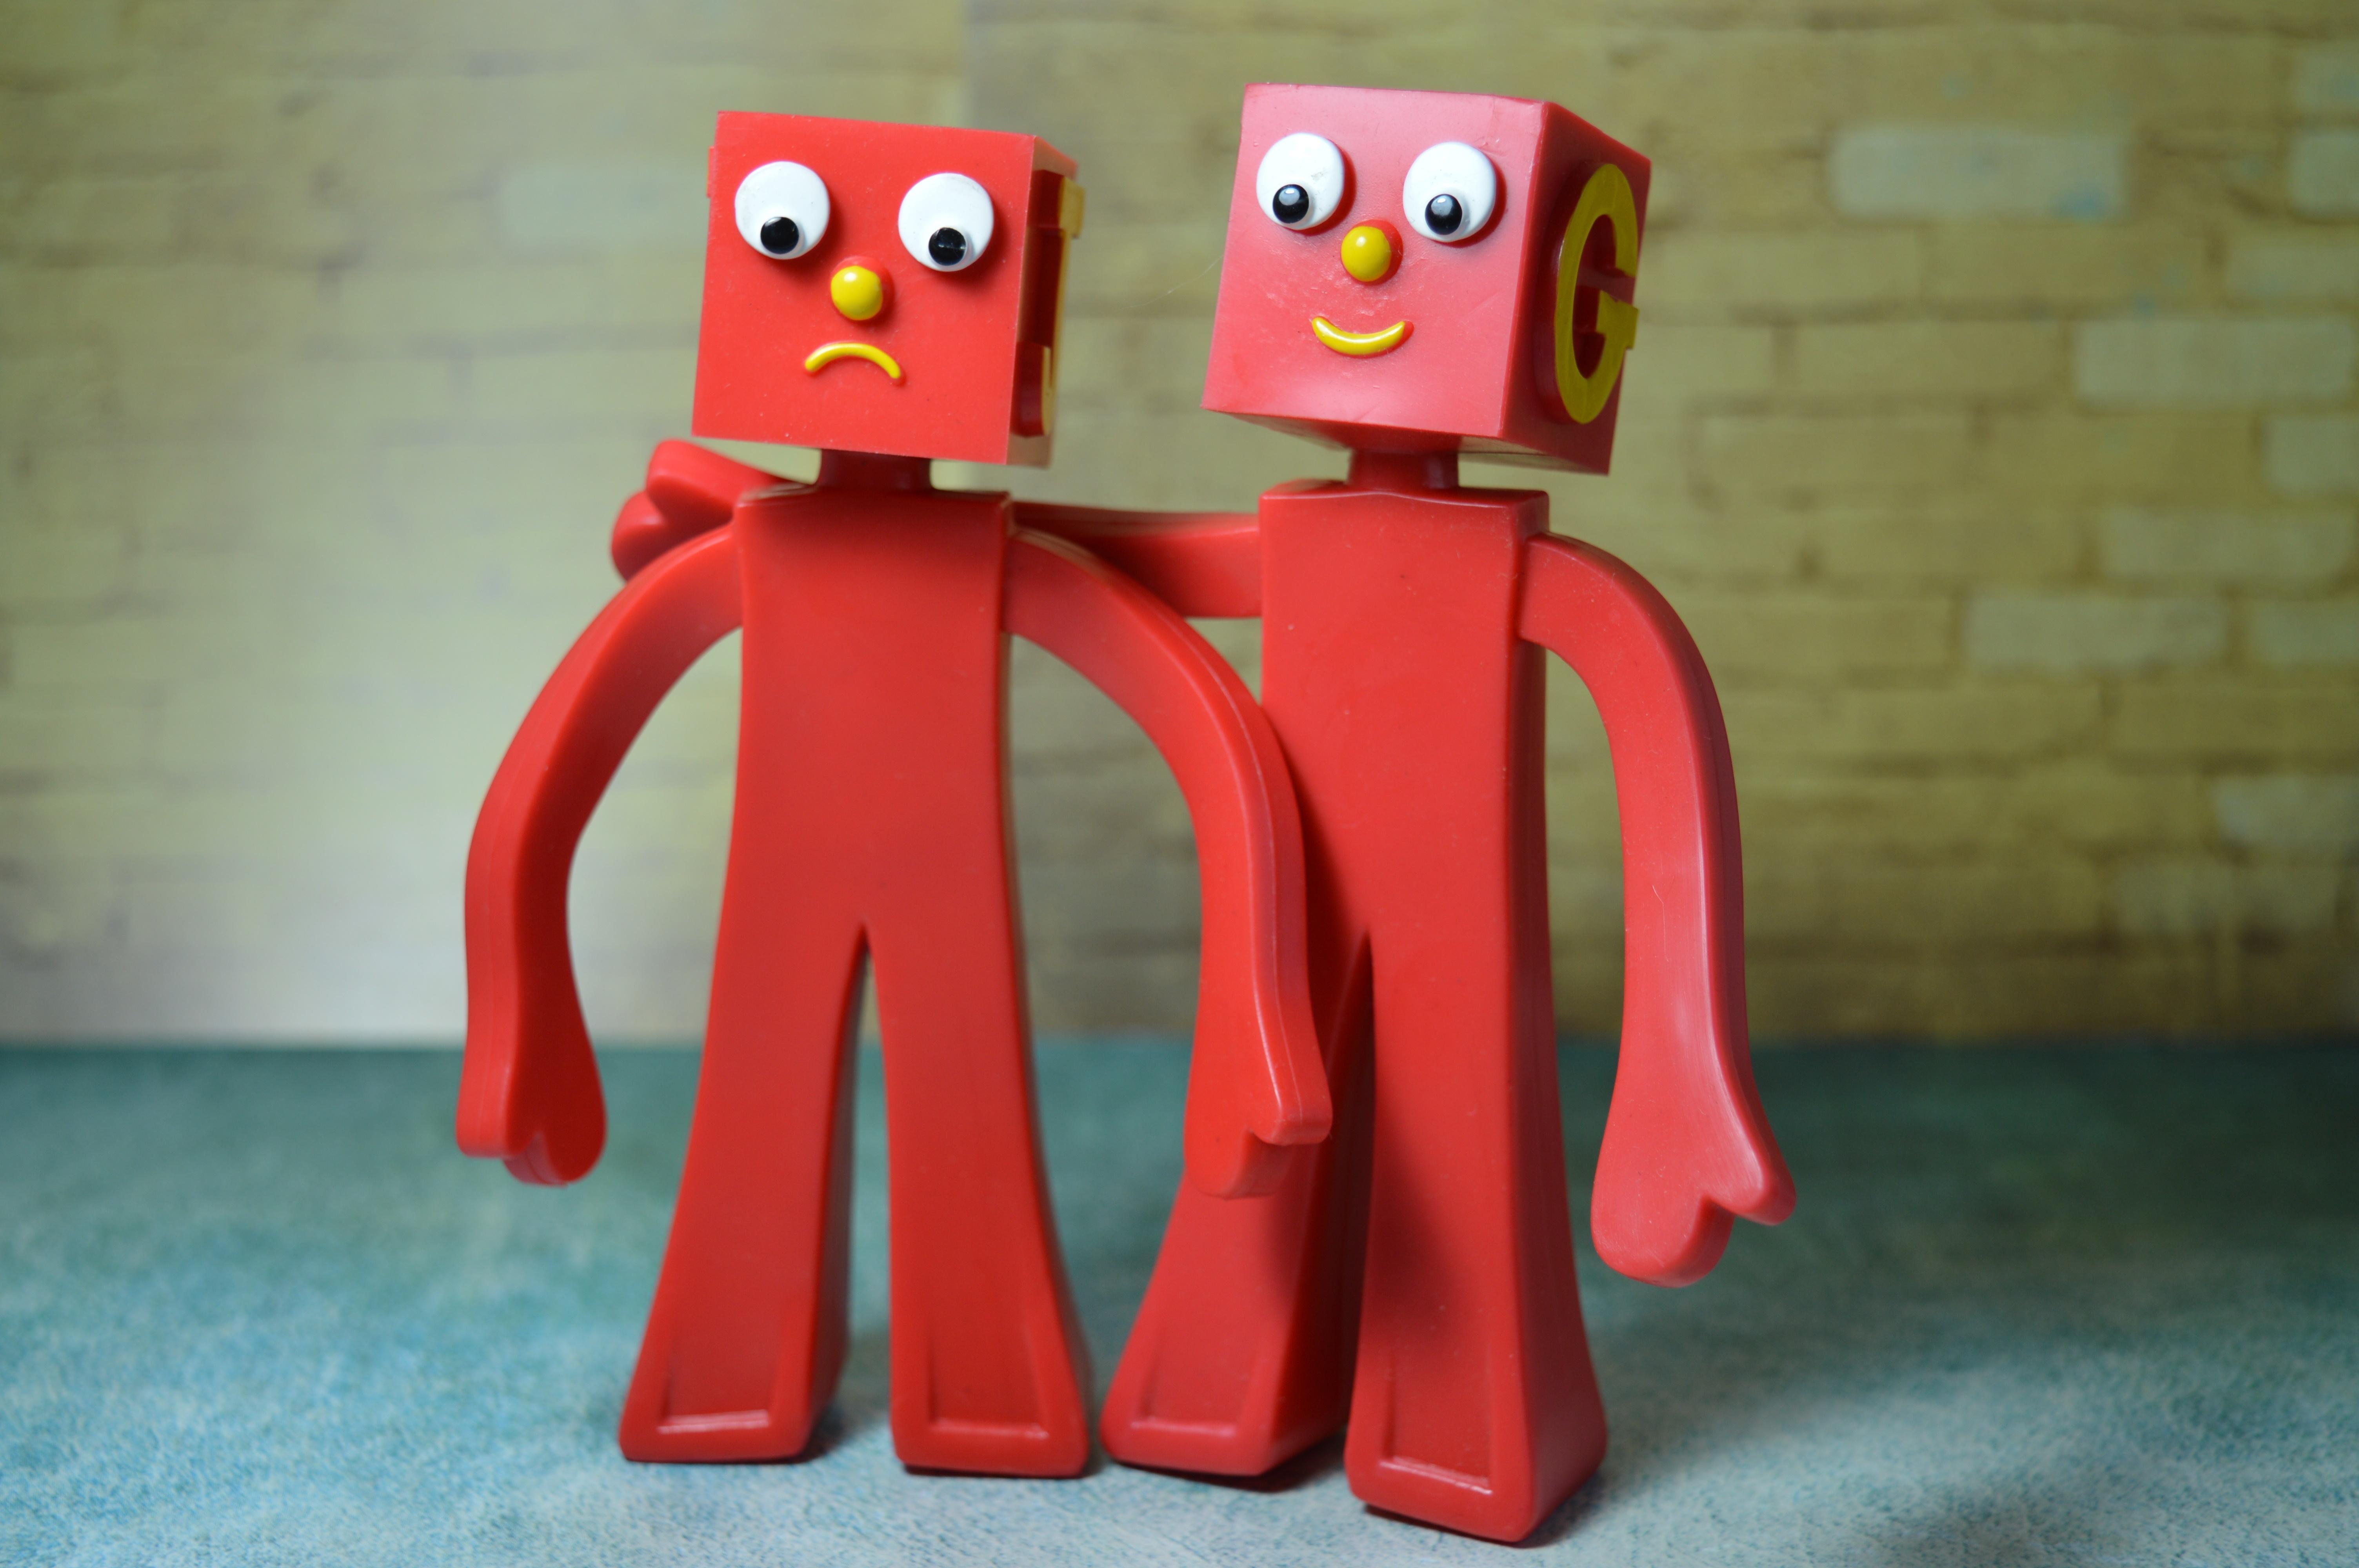 Gambar Merah Persahabatan Bersama Mainan Teman Sobat Sedih